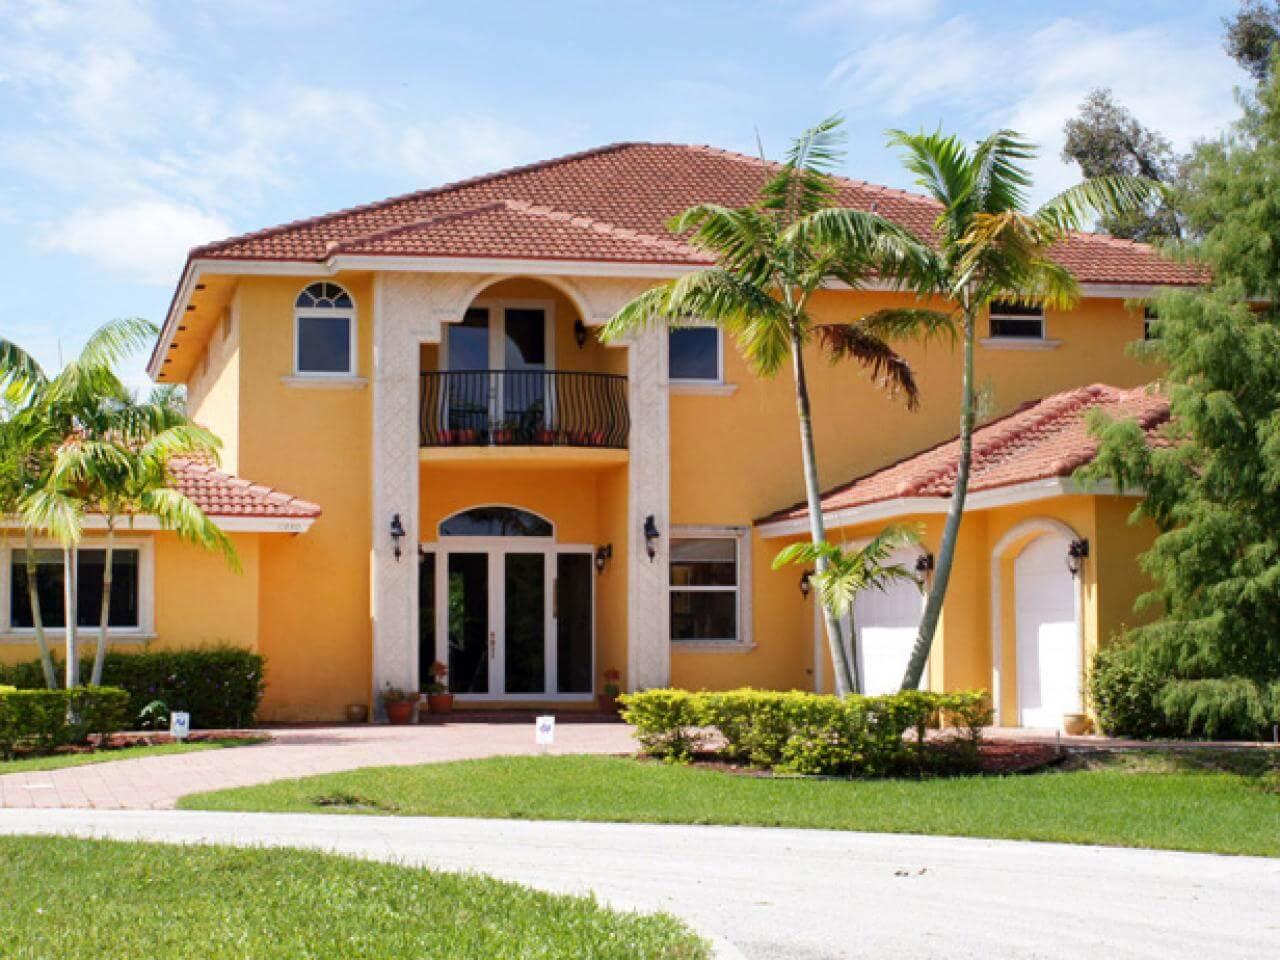 Building a home can be demanding, but rewarding